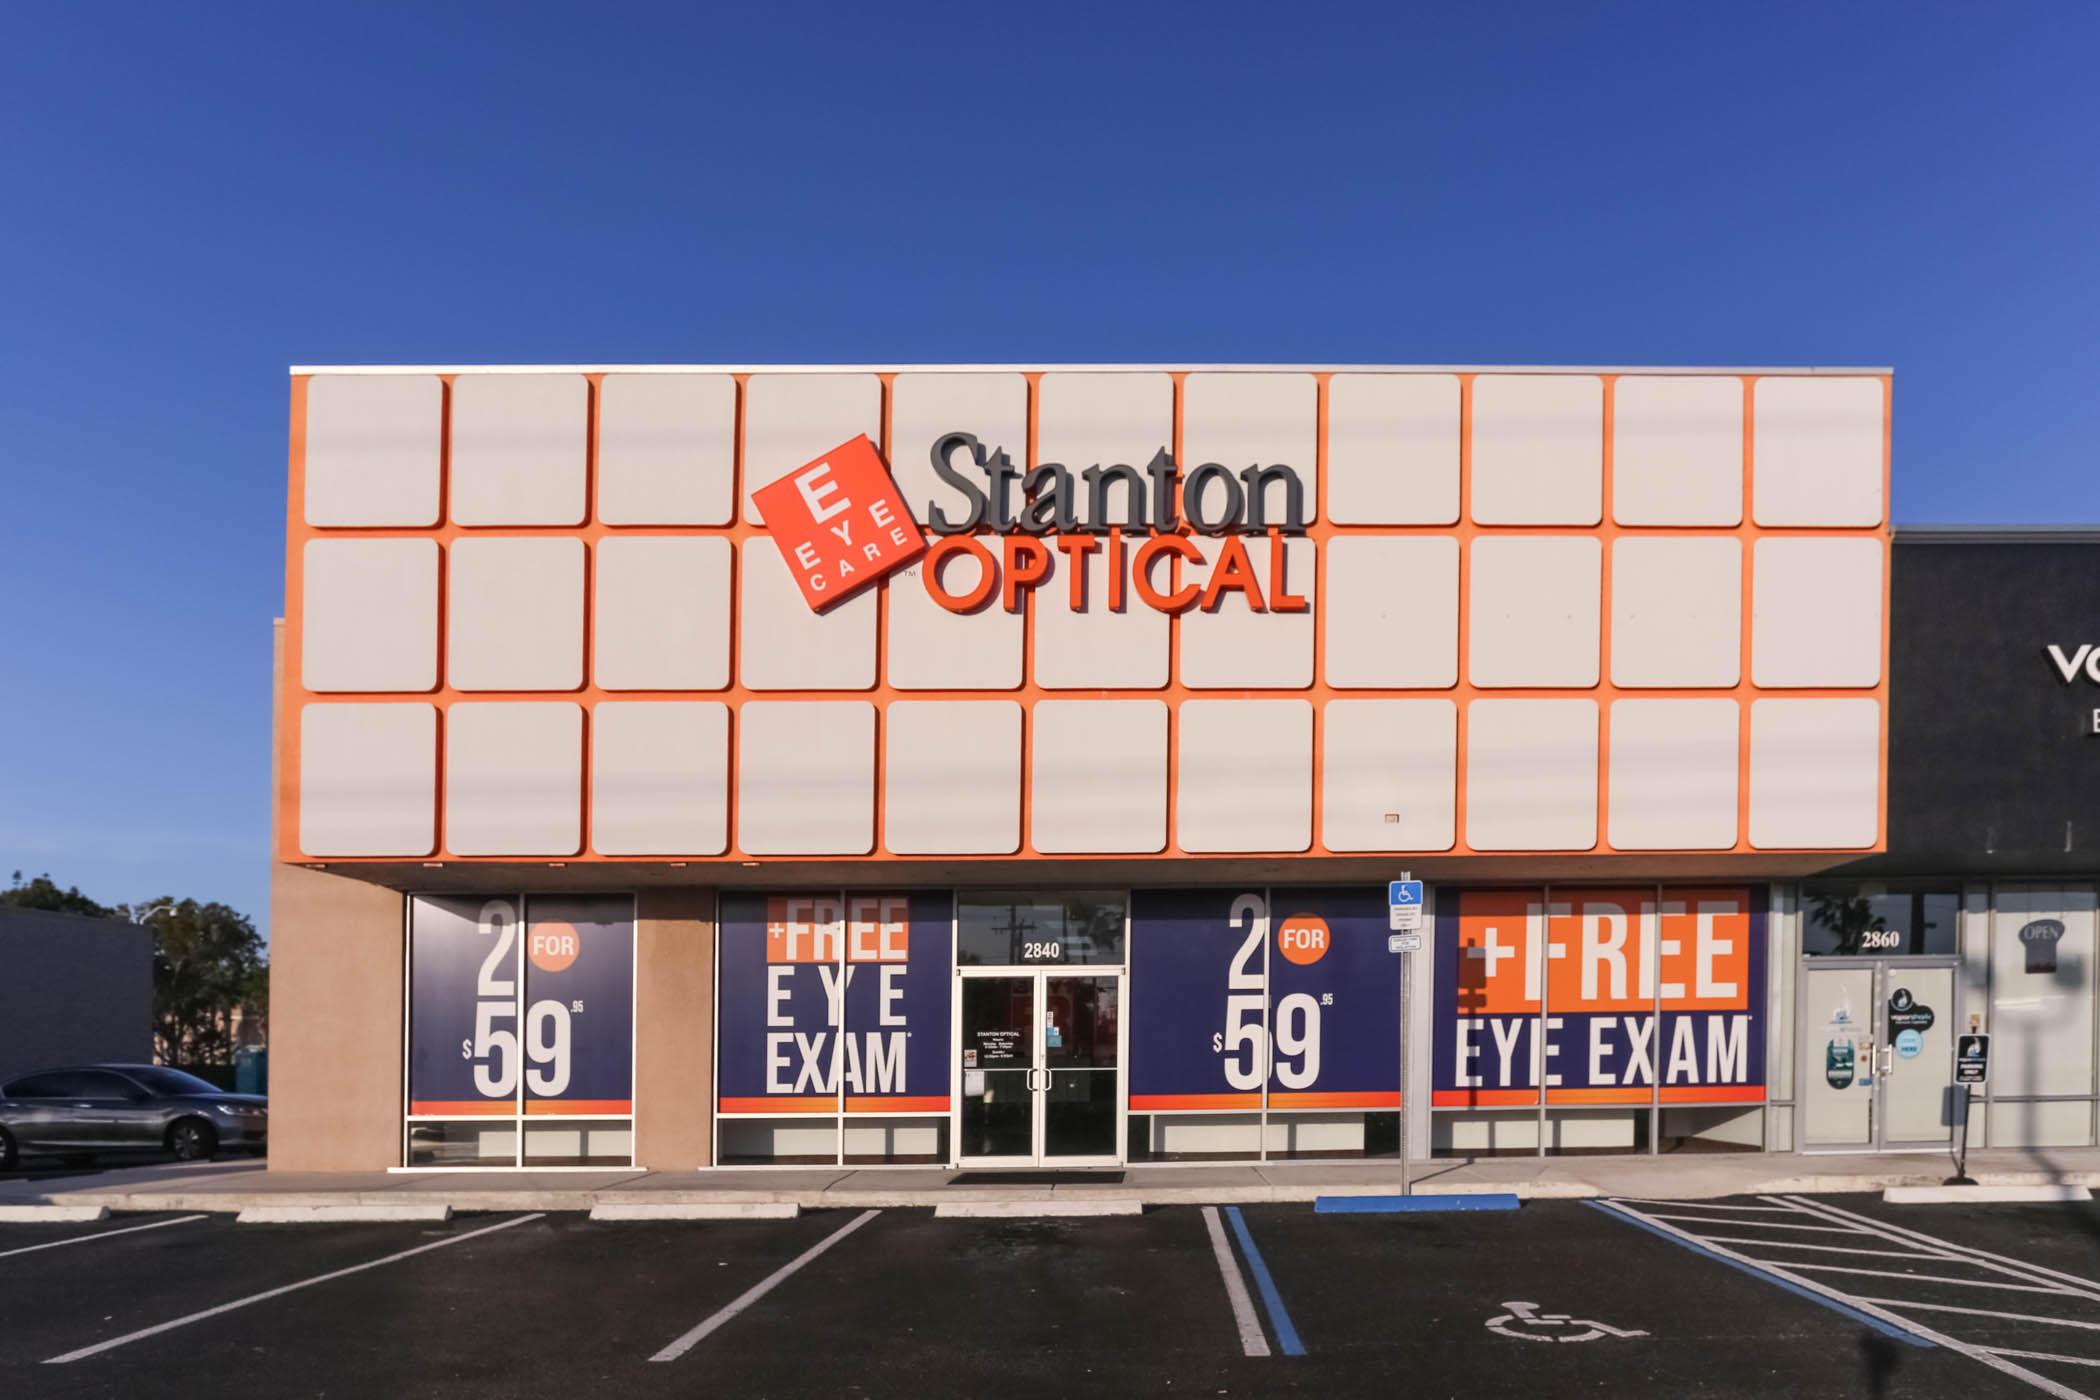 Stanton Optical image 1